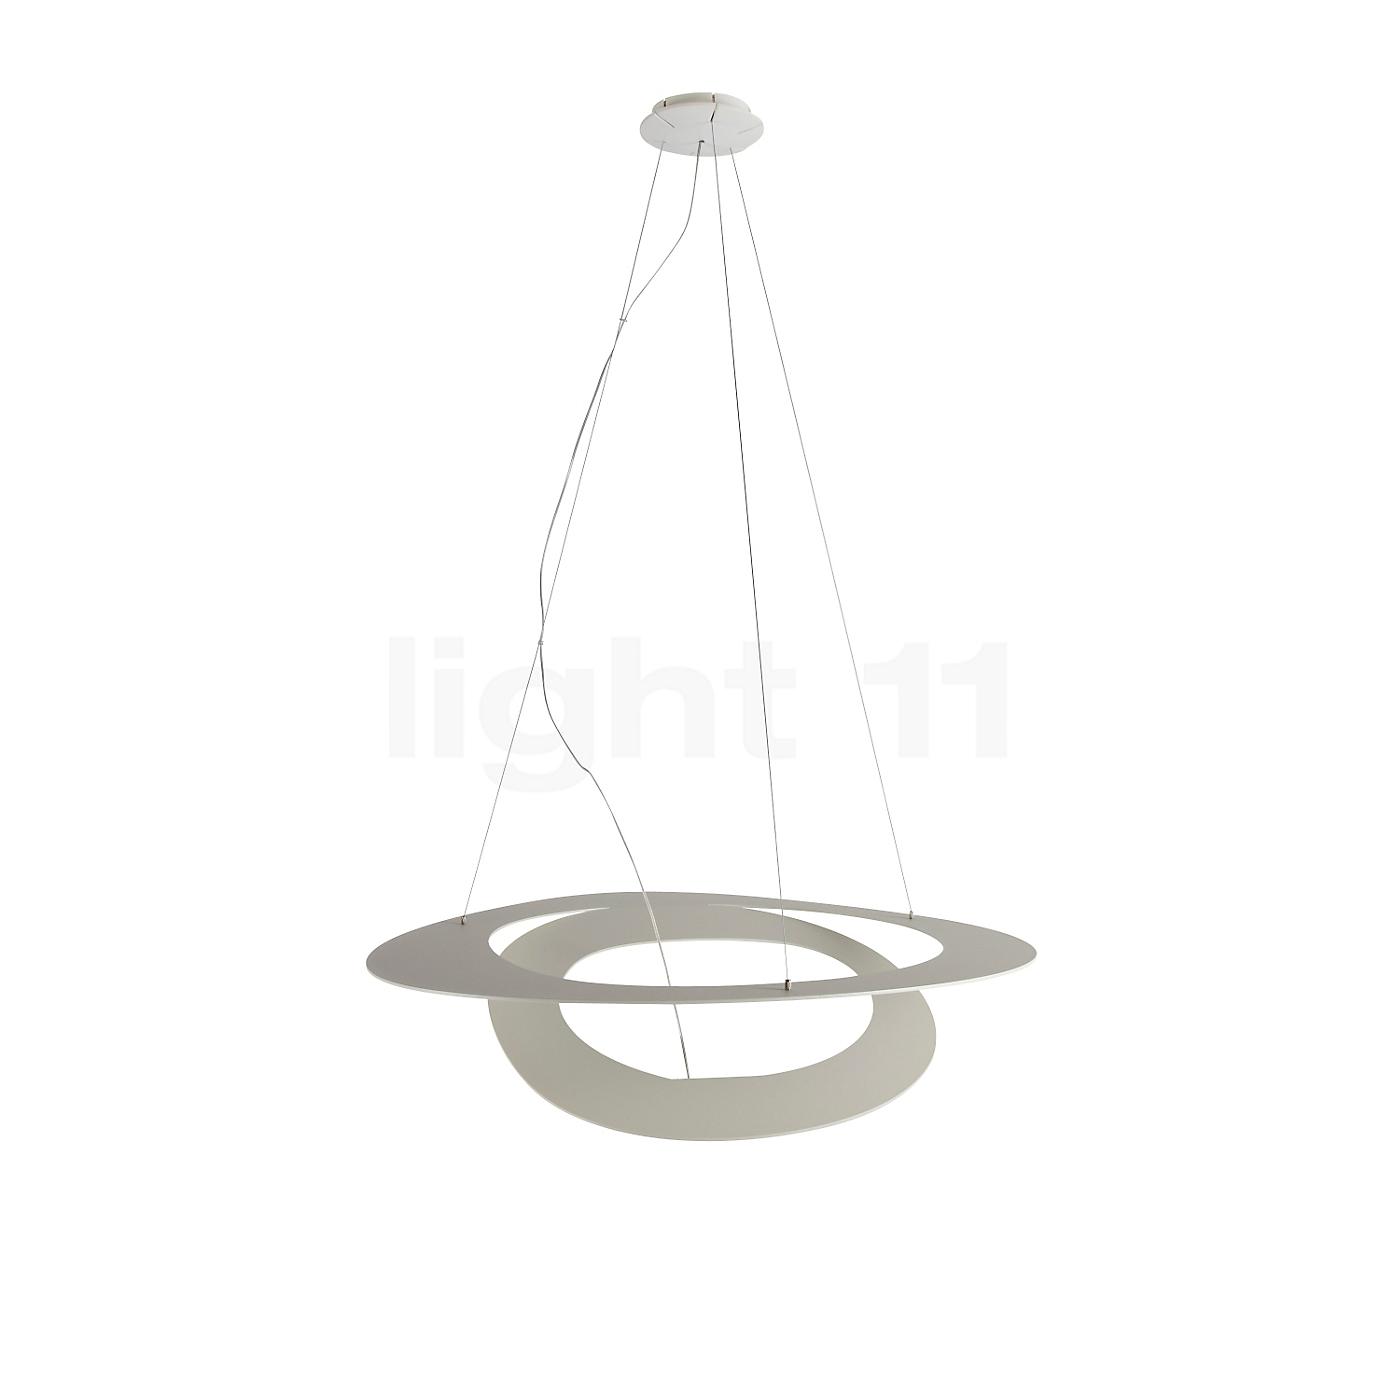 artemide pirce mini sospensione hanglamp kopen op. Black Bedroom Furniture Sets. Home Design Ideas